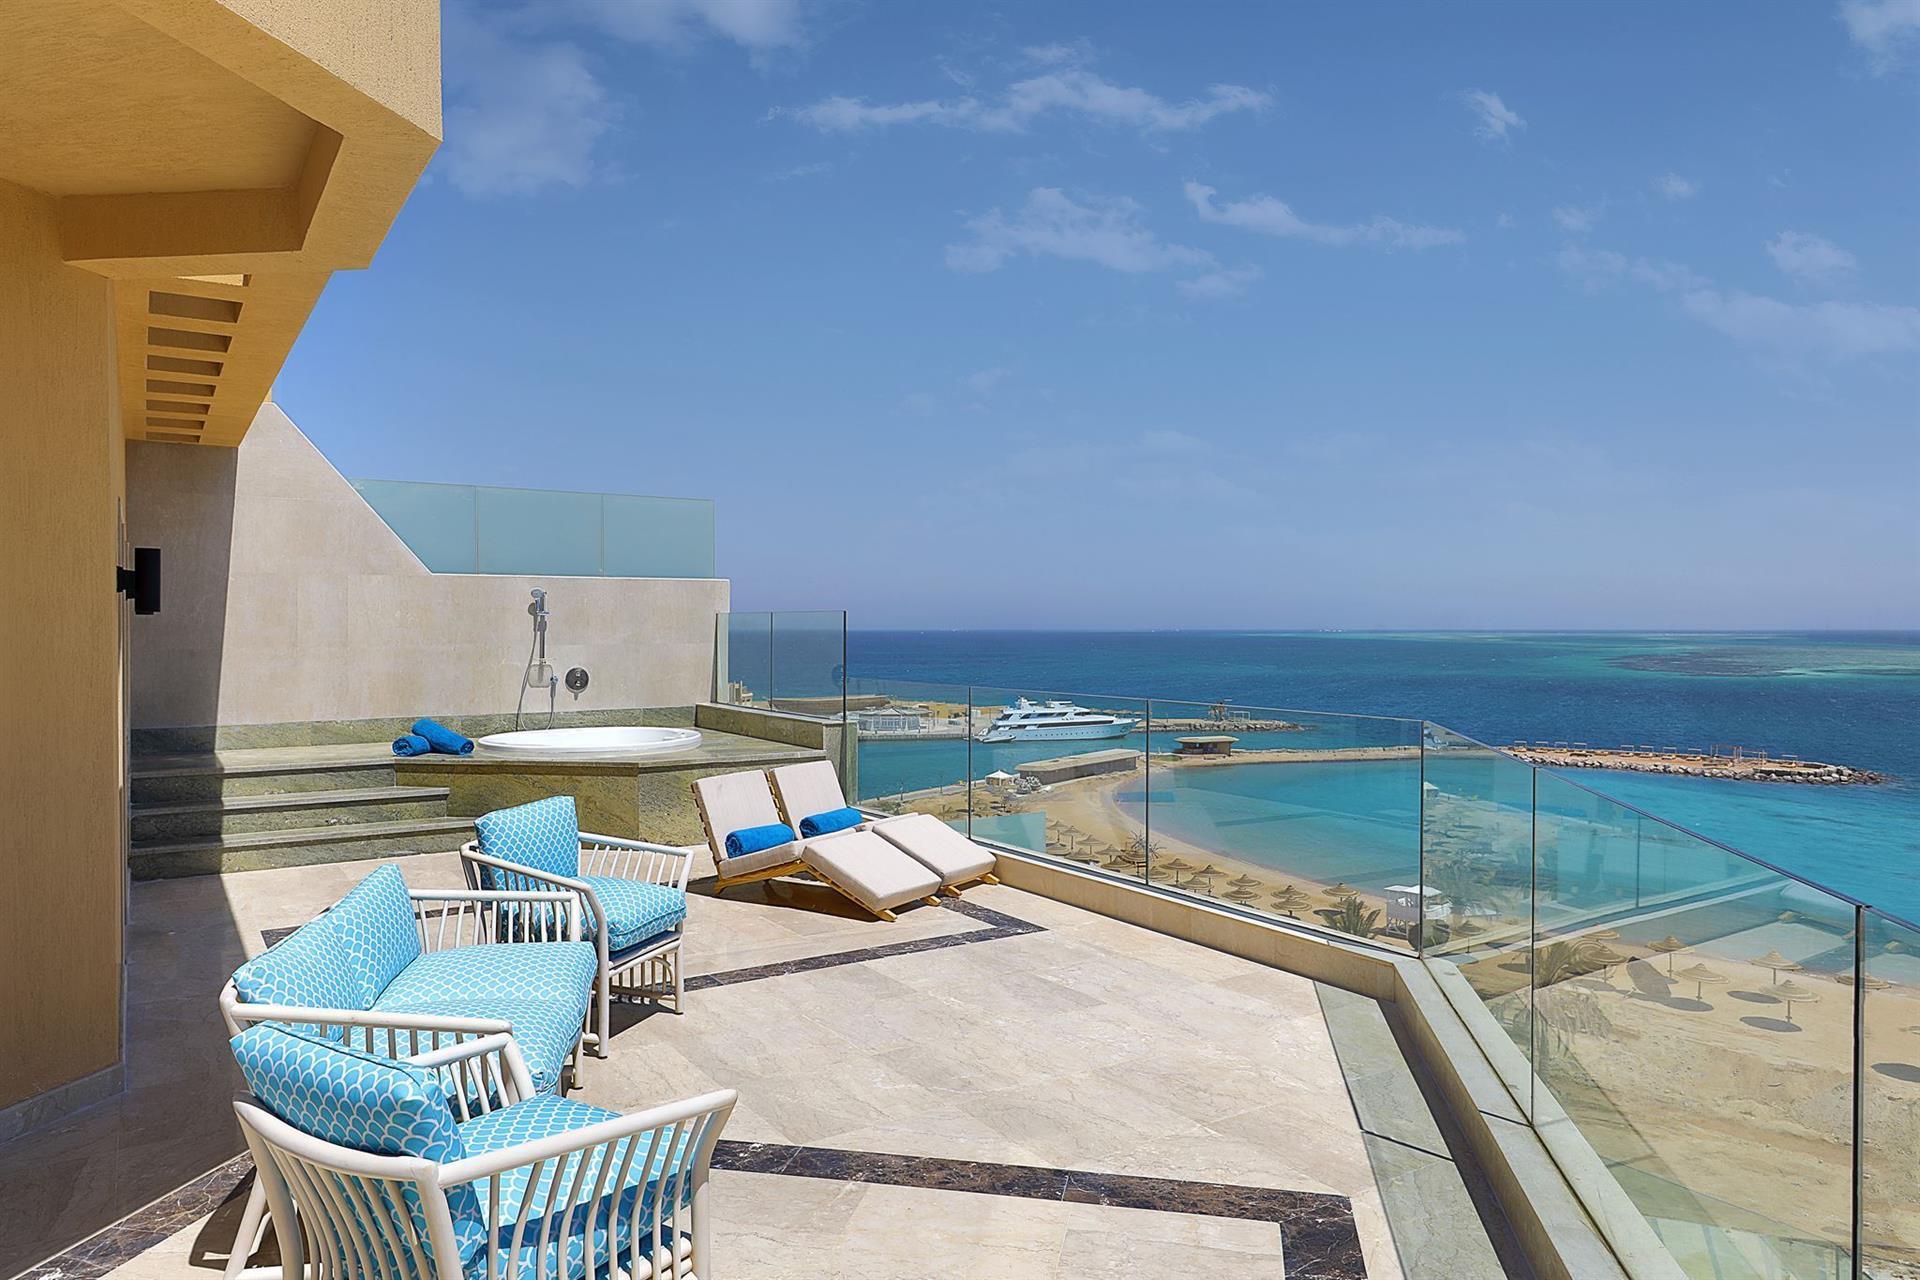 hilton plaza хургада отель: